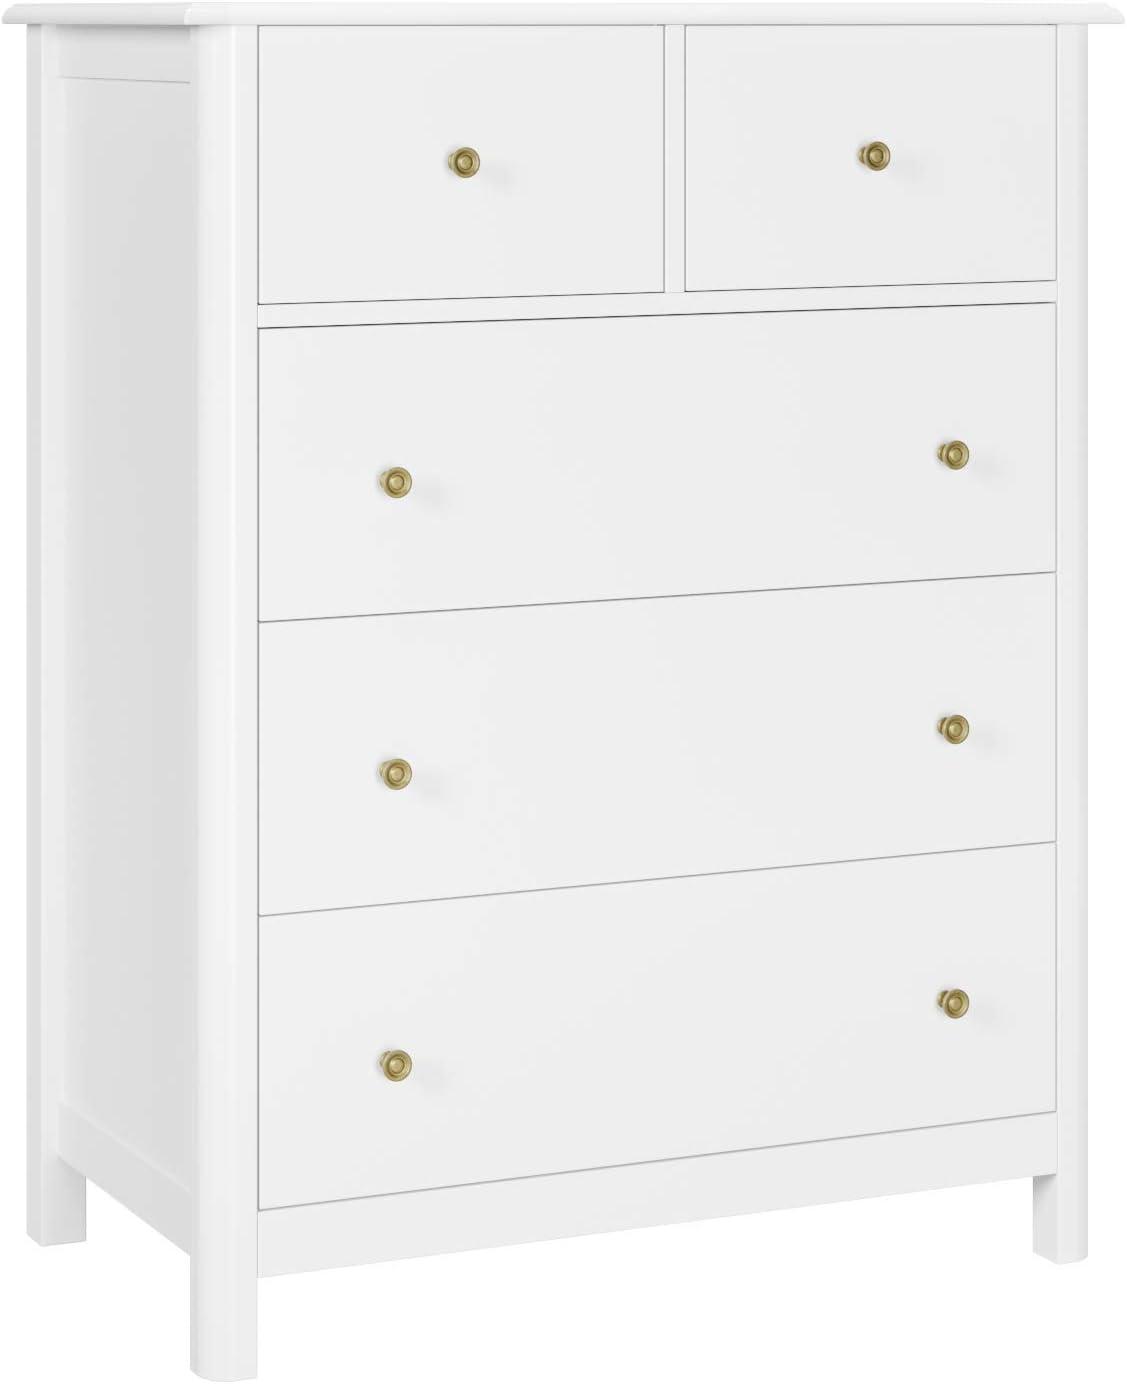 HOMECHO 5 Drawer Dresser, Modern Chest of Drawer, White Dresser Chest for Bedroom, Living Room, Laundry Room, Closet, Wood Frame and Easy Pull Antique Style Handle